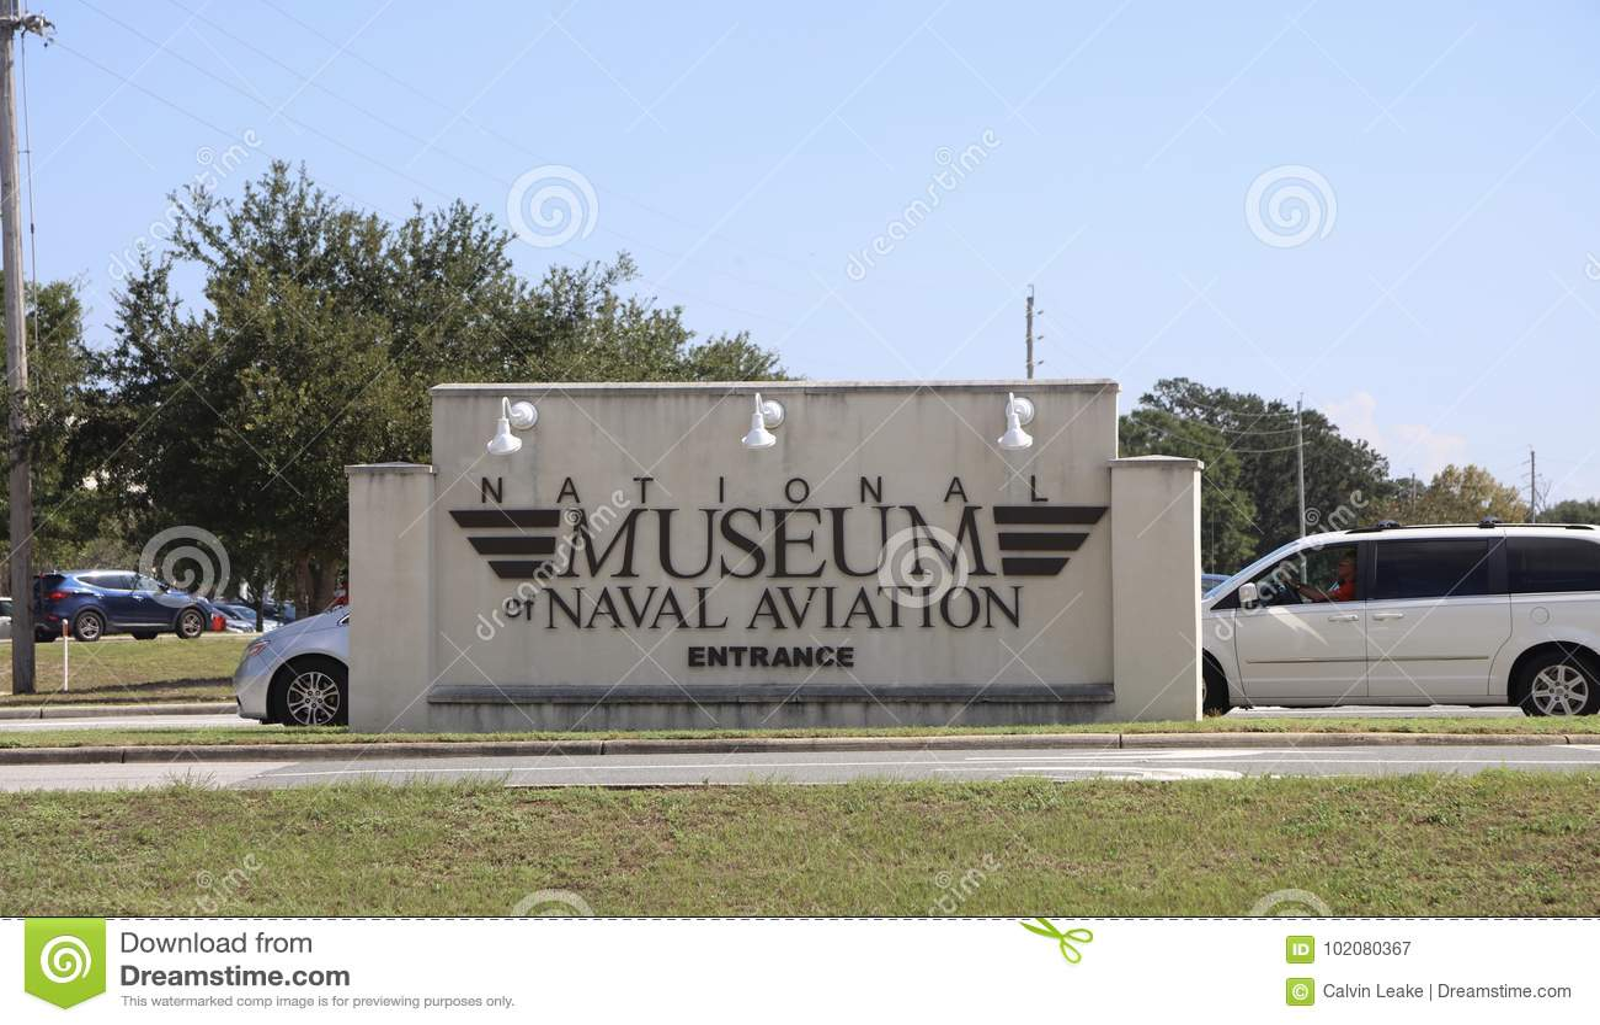 Nationales Luftfahrt-Museum, Pensacola, Florida